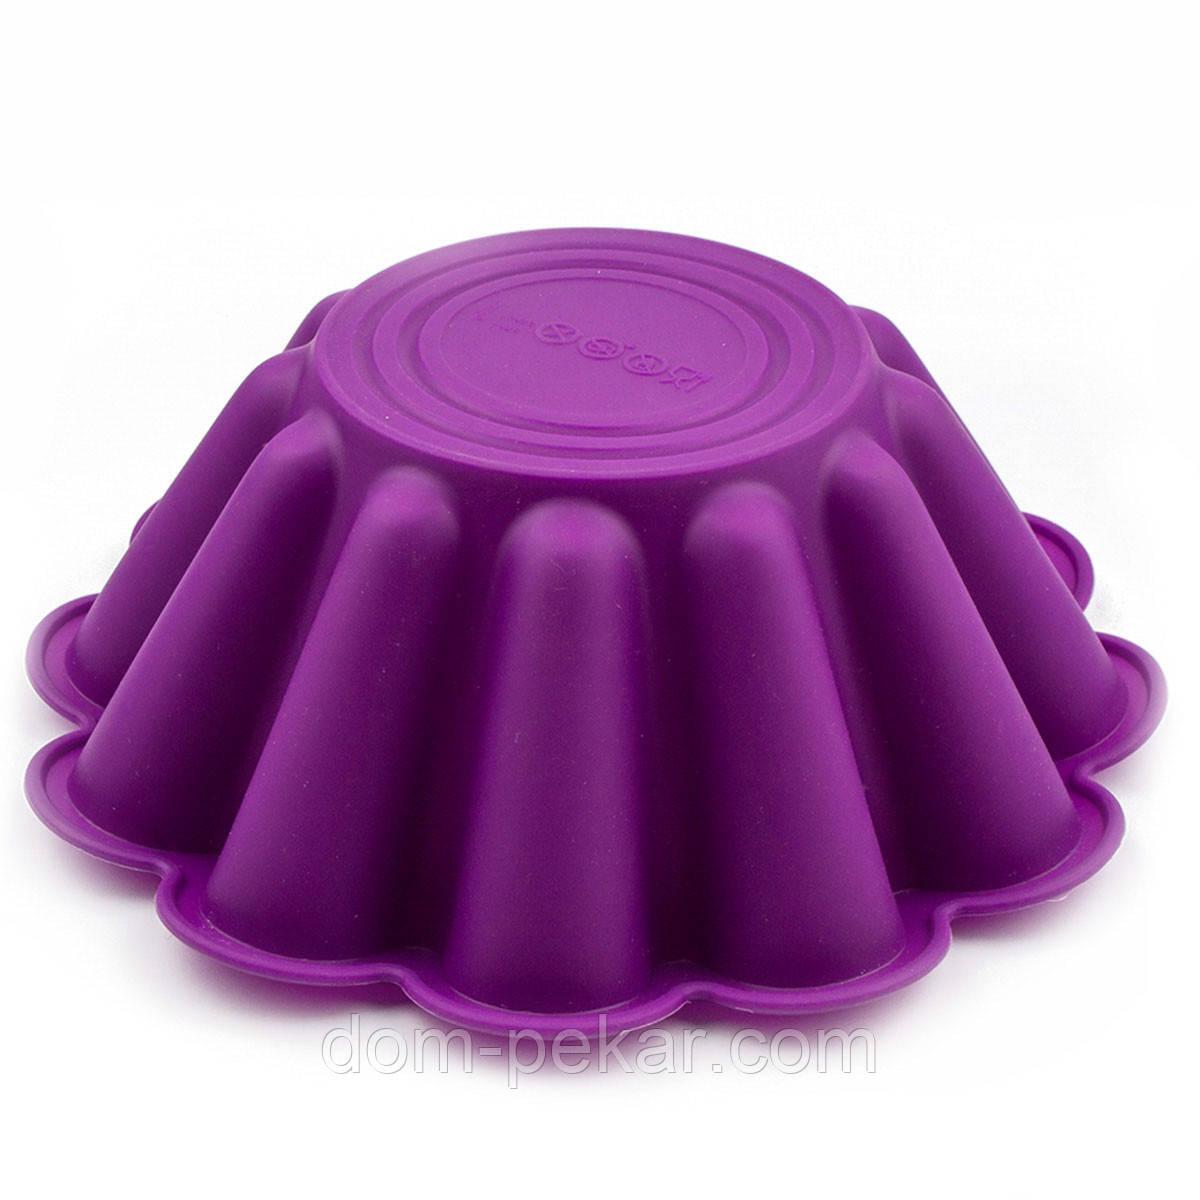 Форма силикон Ромовая бабка